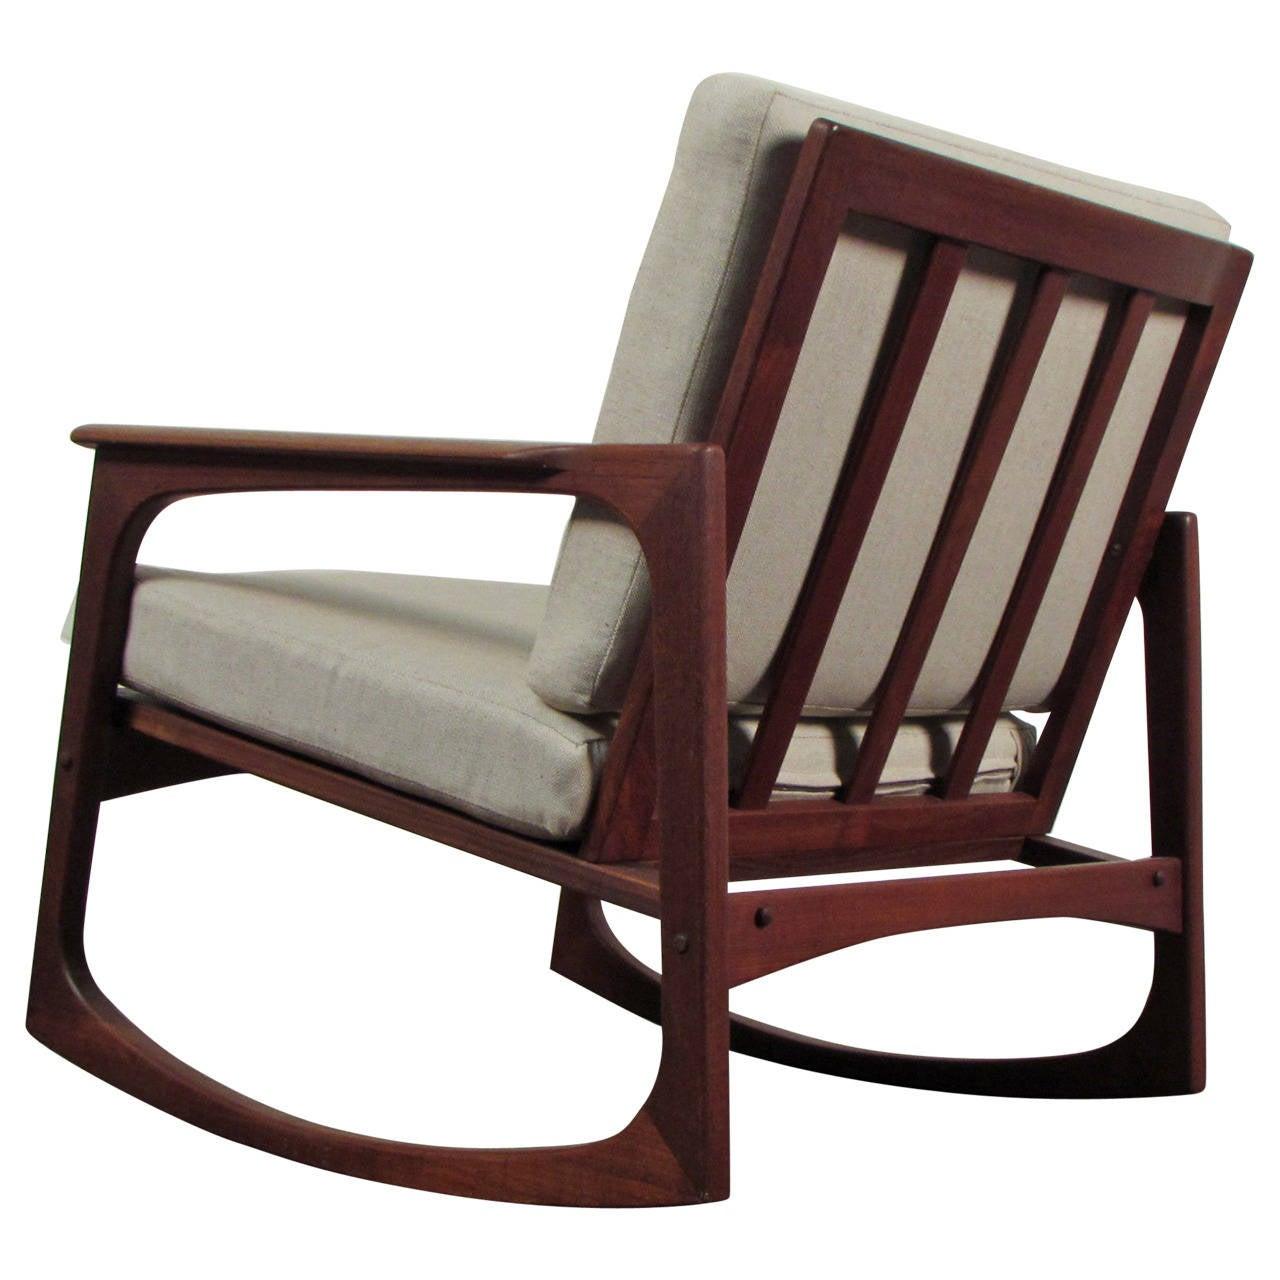 danish modern rocking chair antique blue dining chairs jacob kjaer teak at 1stdibs